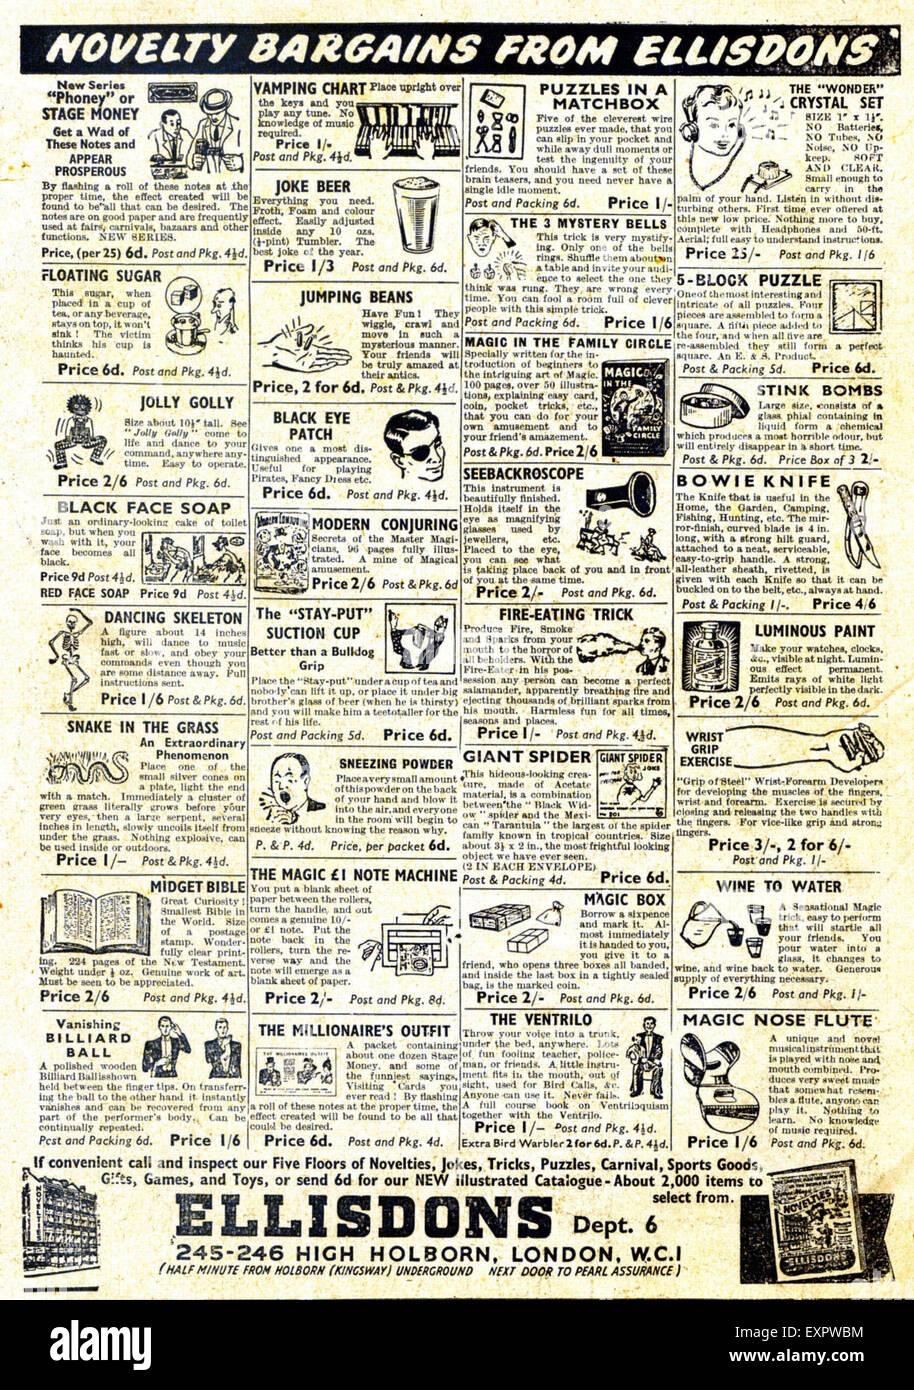 1960s UK Ellisdons Jokes Practical Magazine Advert - Stock Image